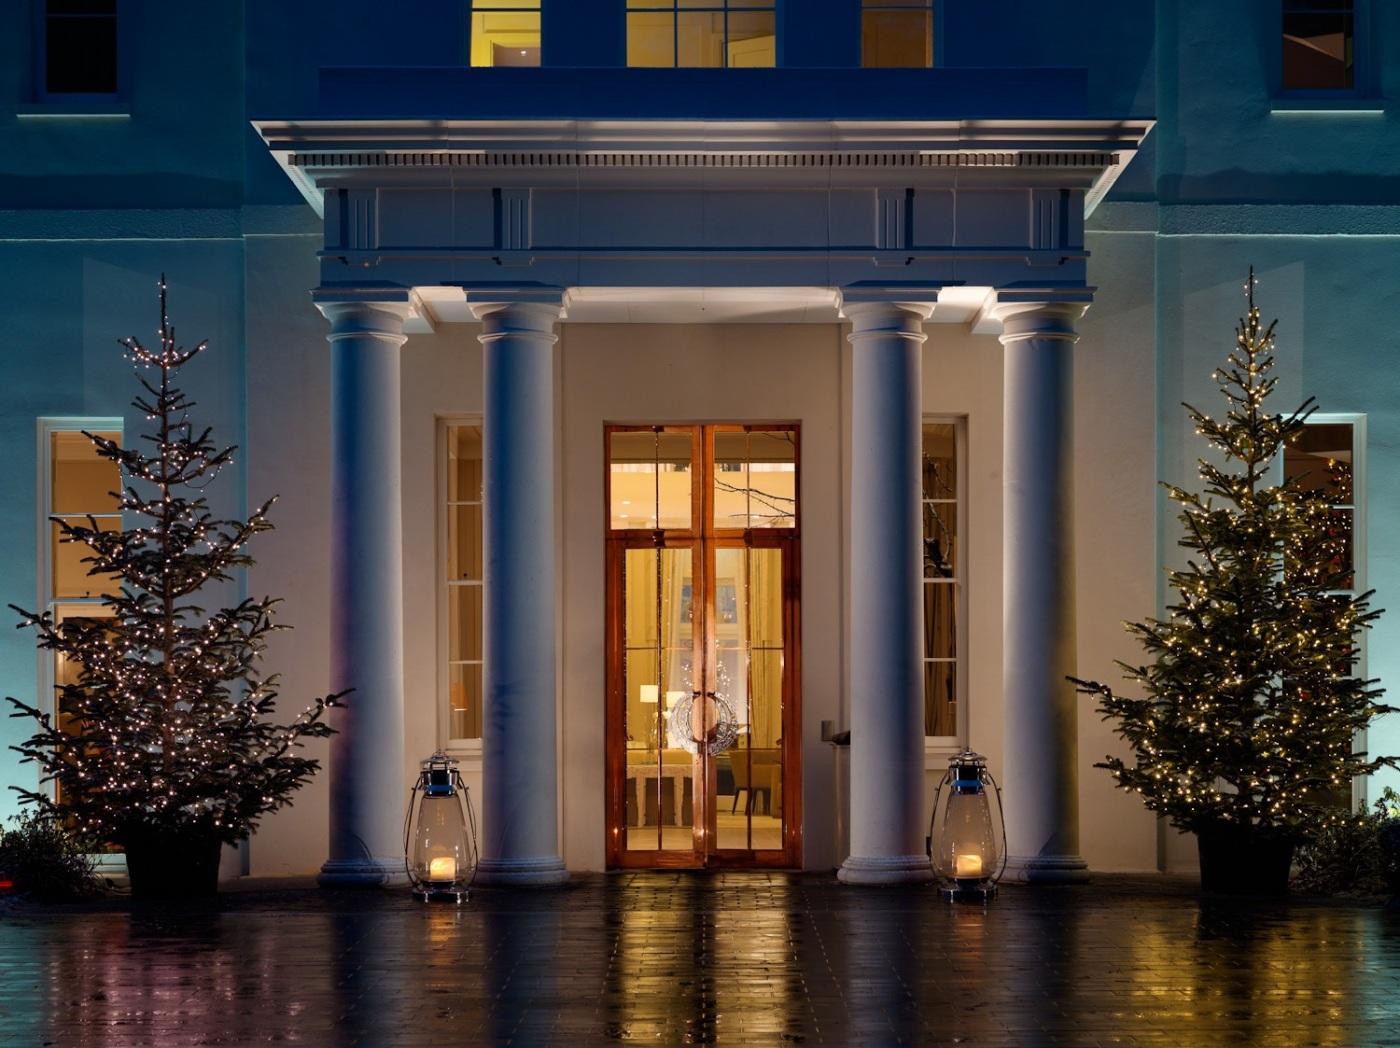 Entrance - Christmas - Coworth Park 1157-45-2